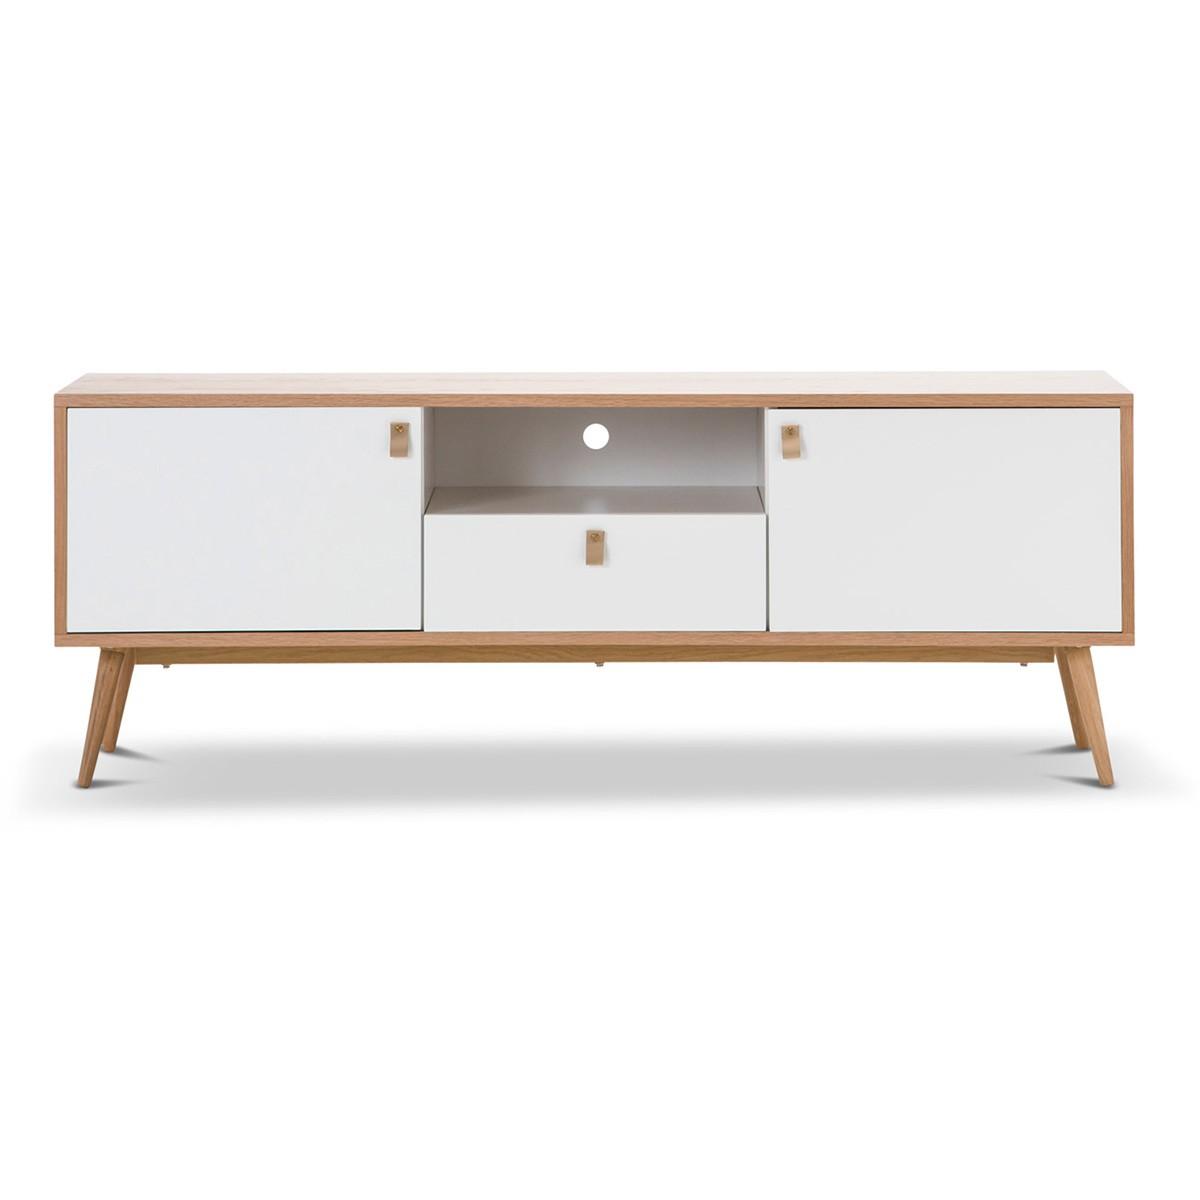 Liena Scandinavian Wooden Lowline TV Unit, 150cm